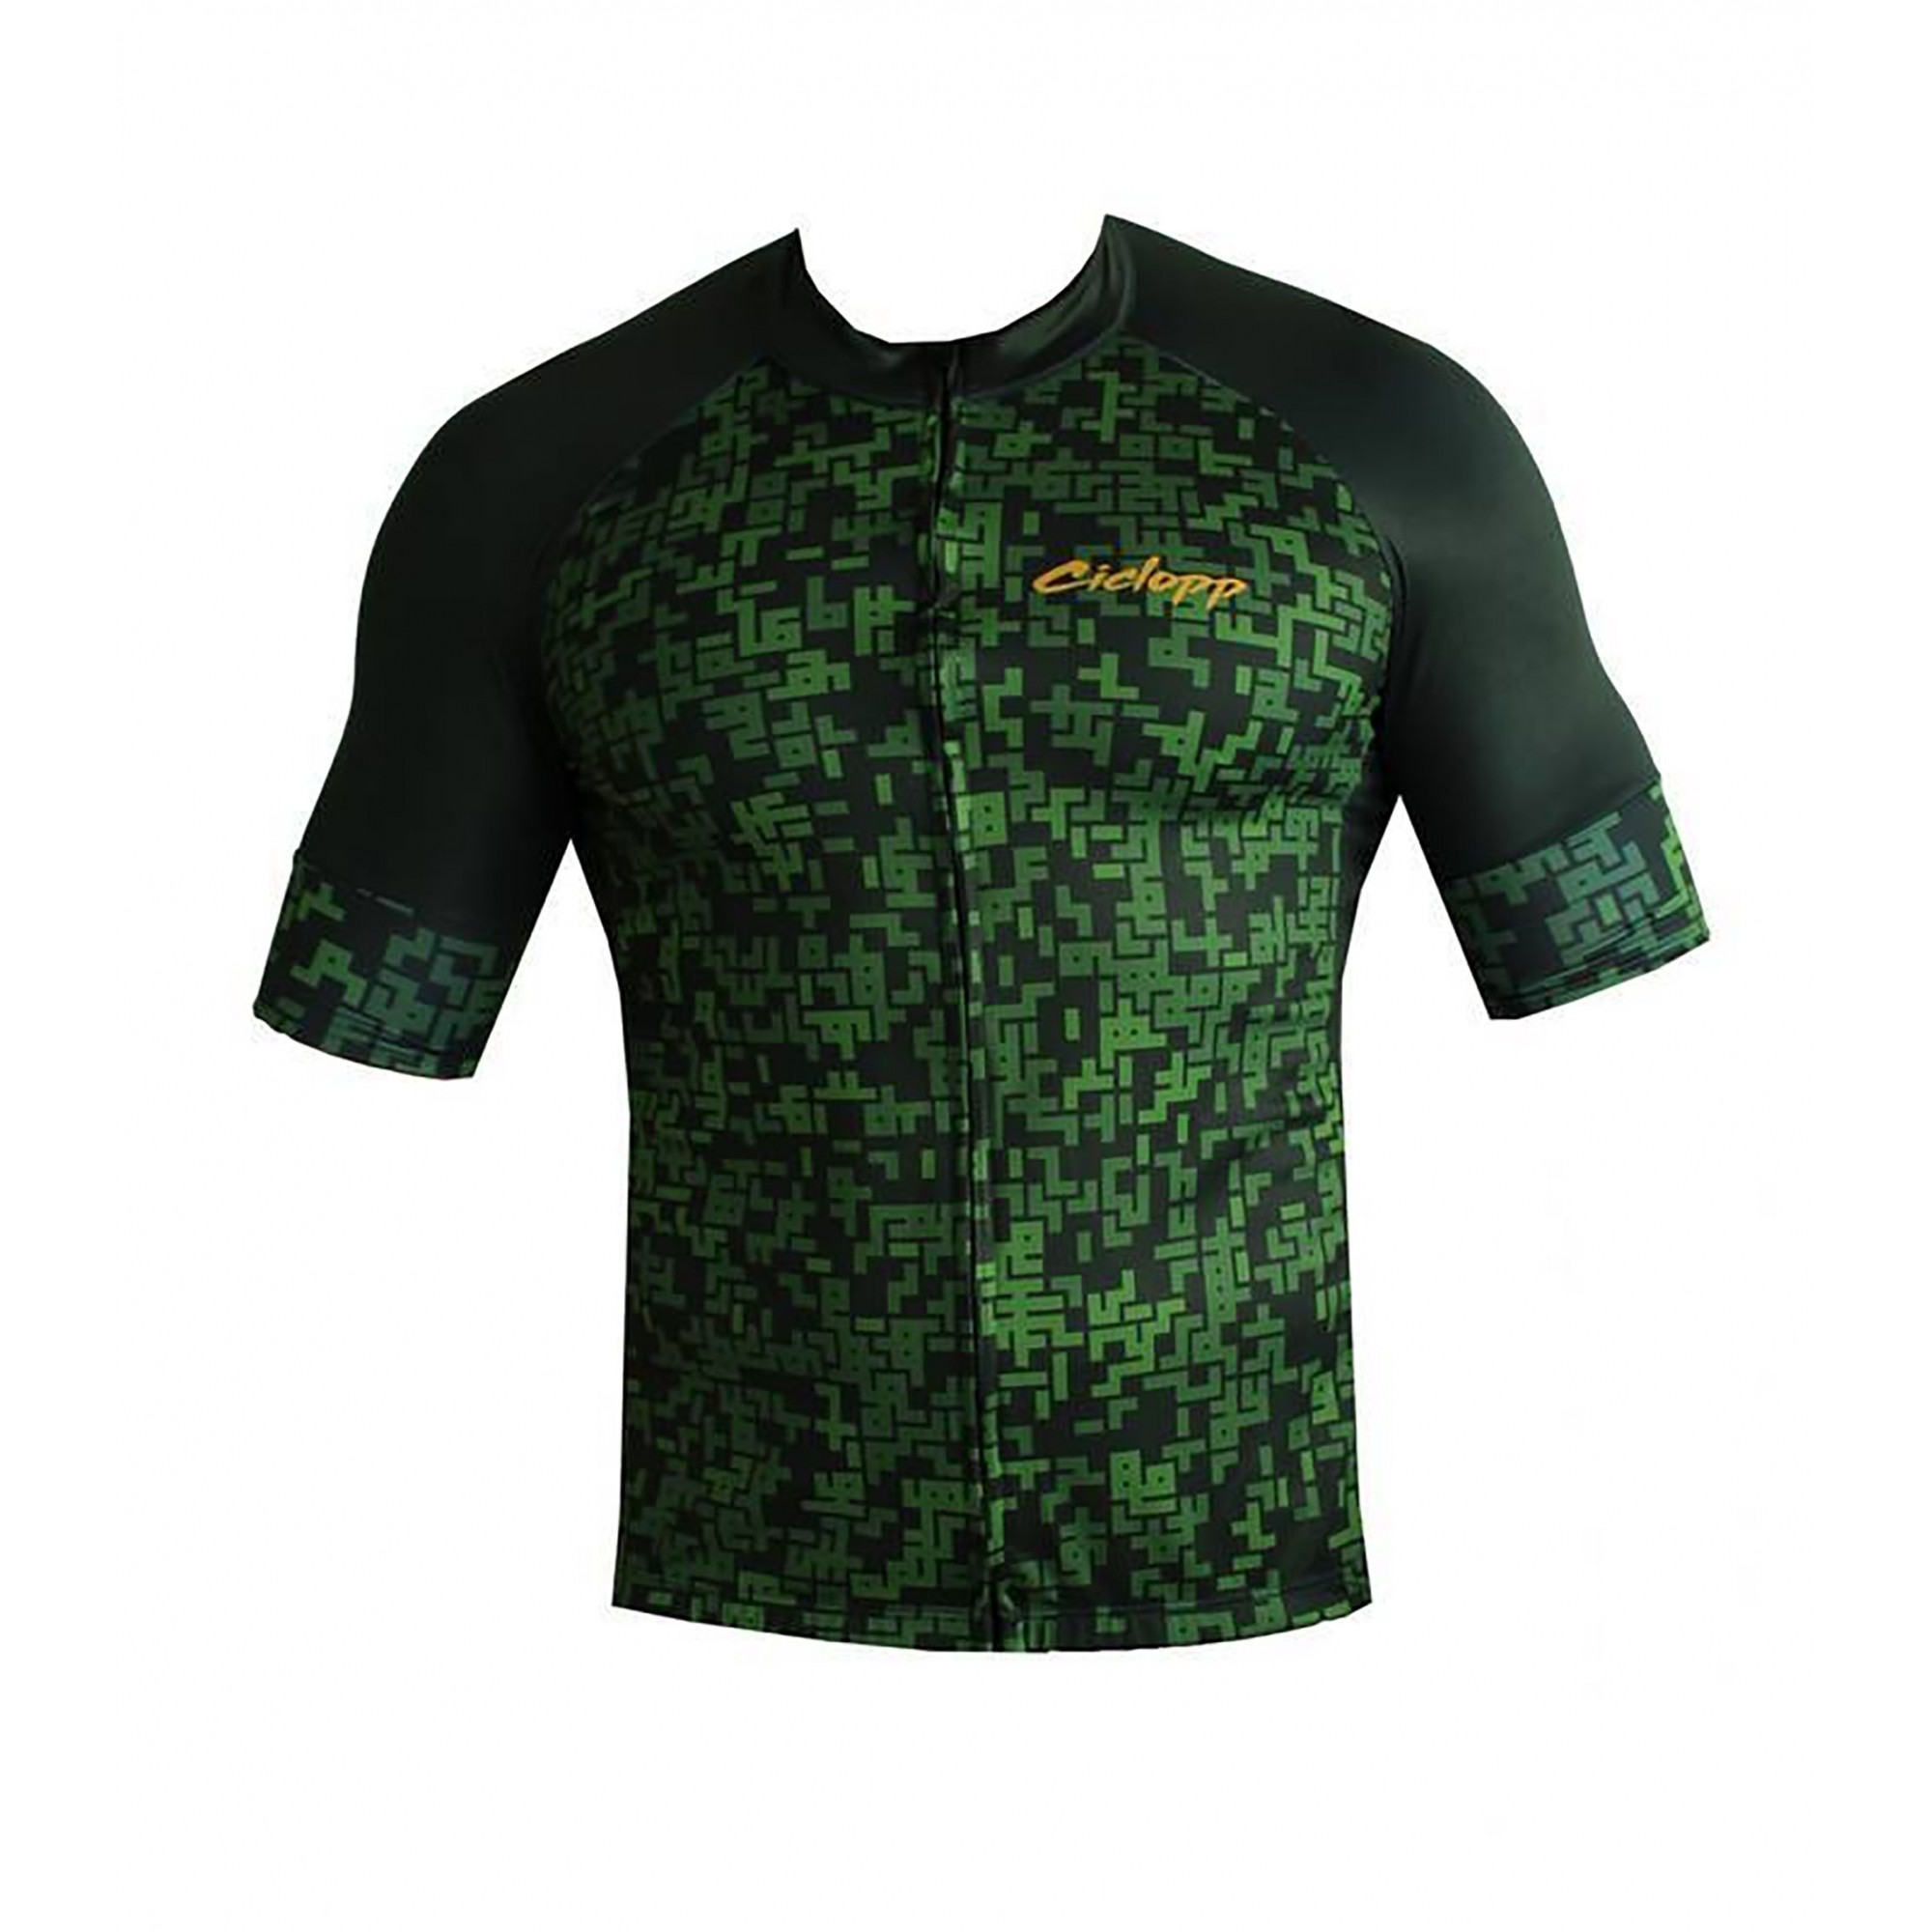 Camisa Ciclismo Army - Ciclopp